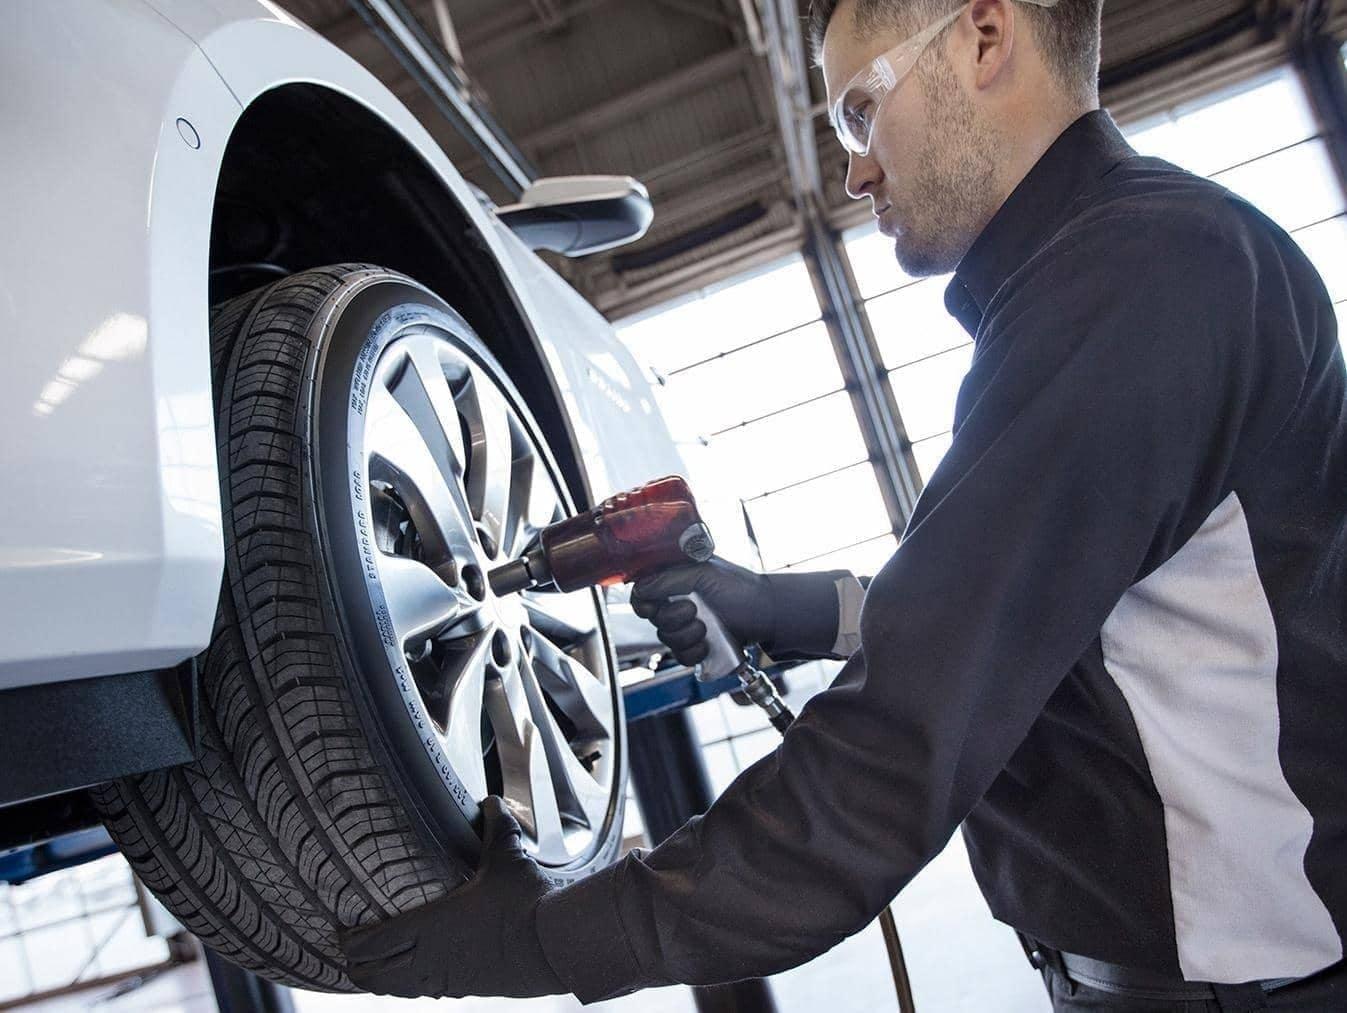 Tires mechanic service